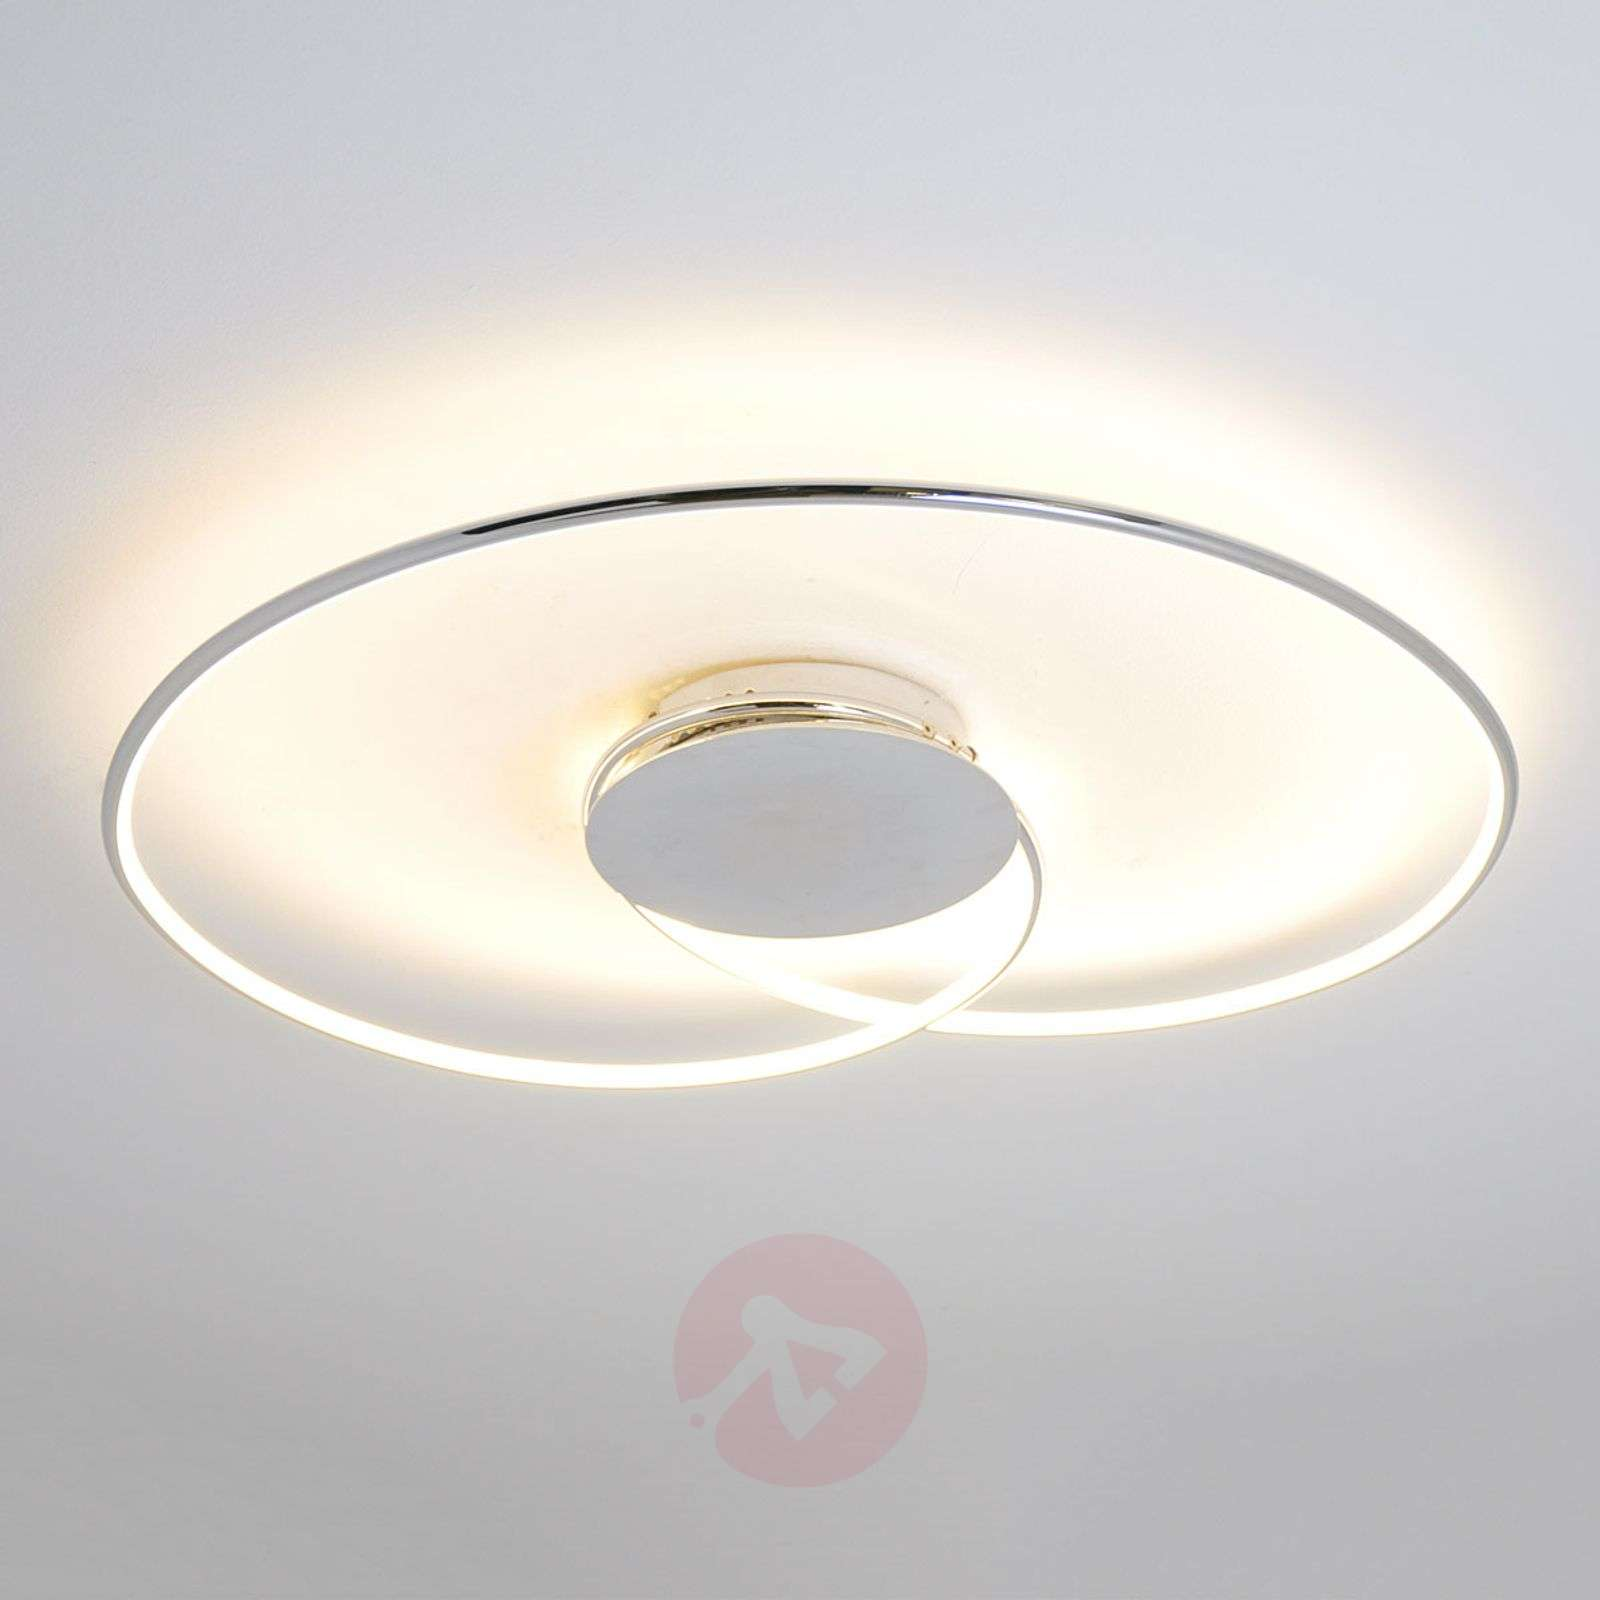 Graceful LED ceiling lamp Joline-9639014-01